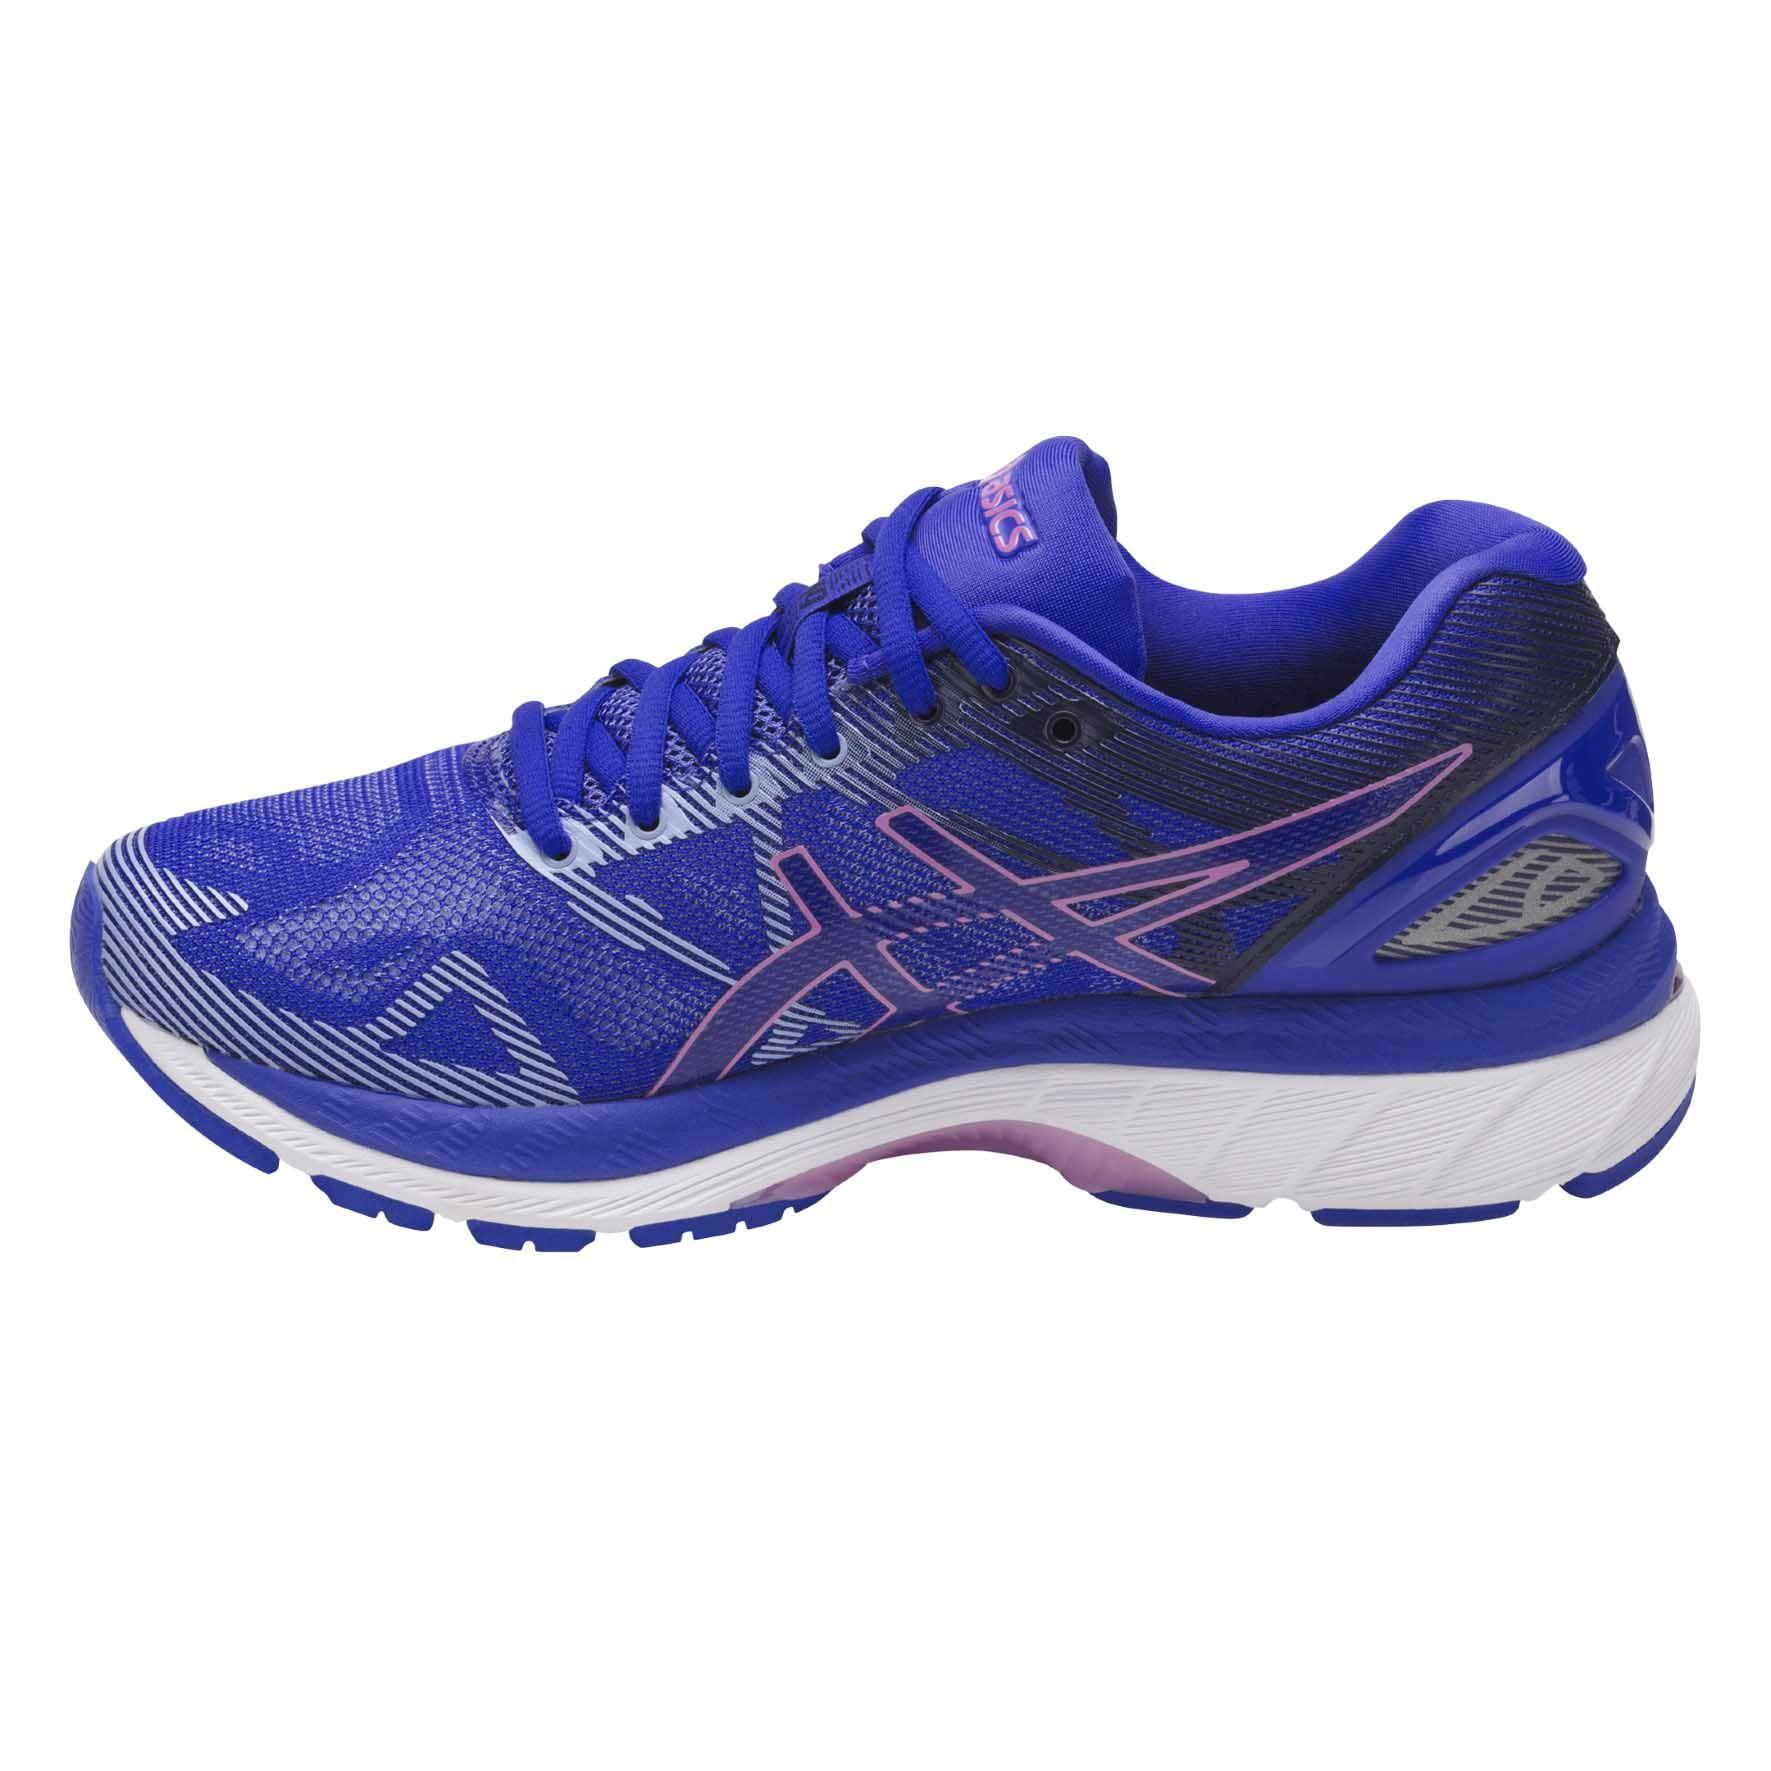 Asics Ladies Running Shoes Size